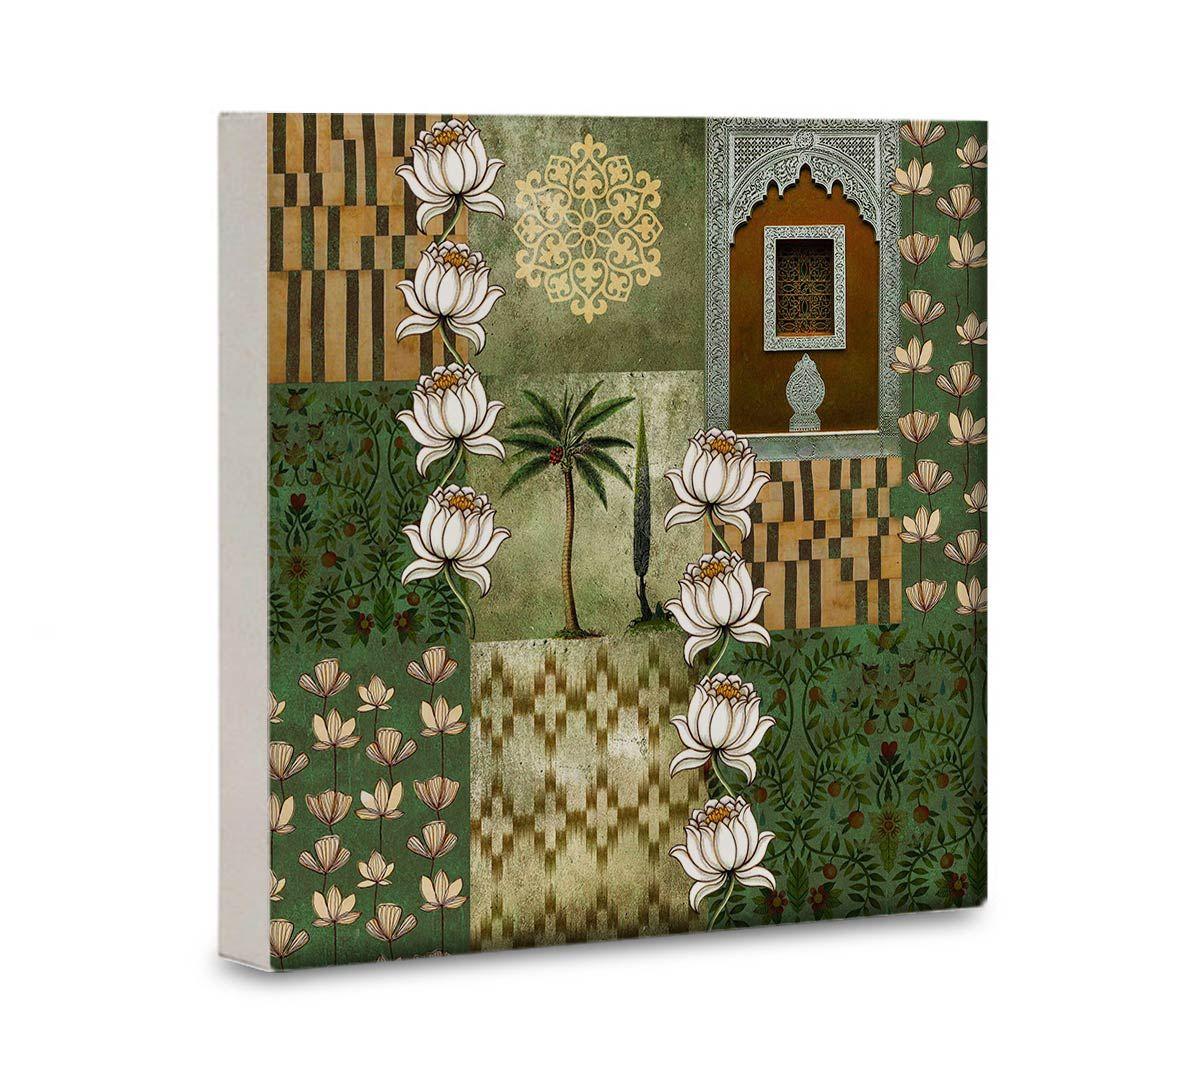 India Circus Tiled Lotus Extravaganza 16x16 and 24x24 Canvas Wall Art